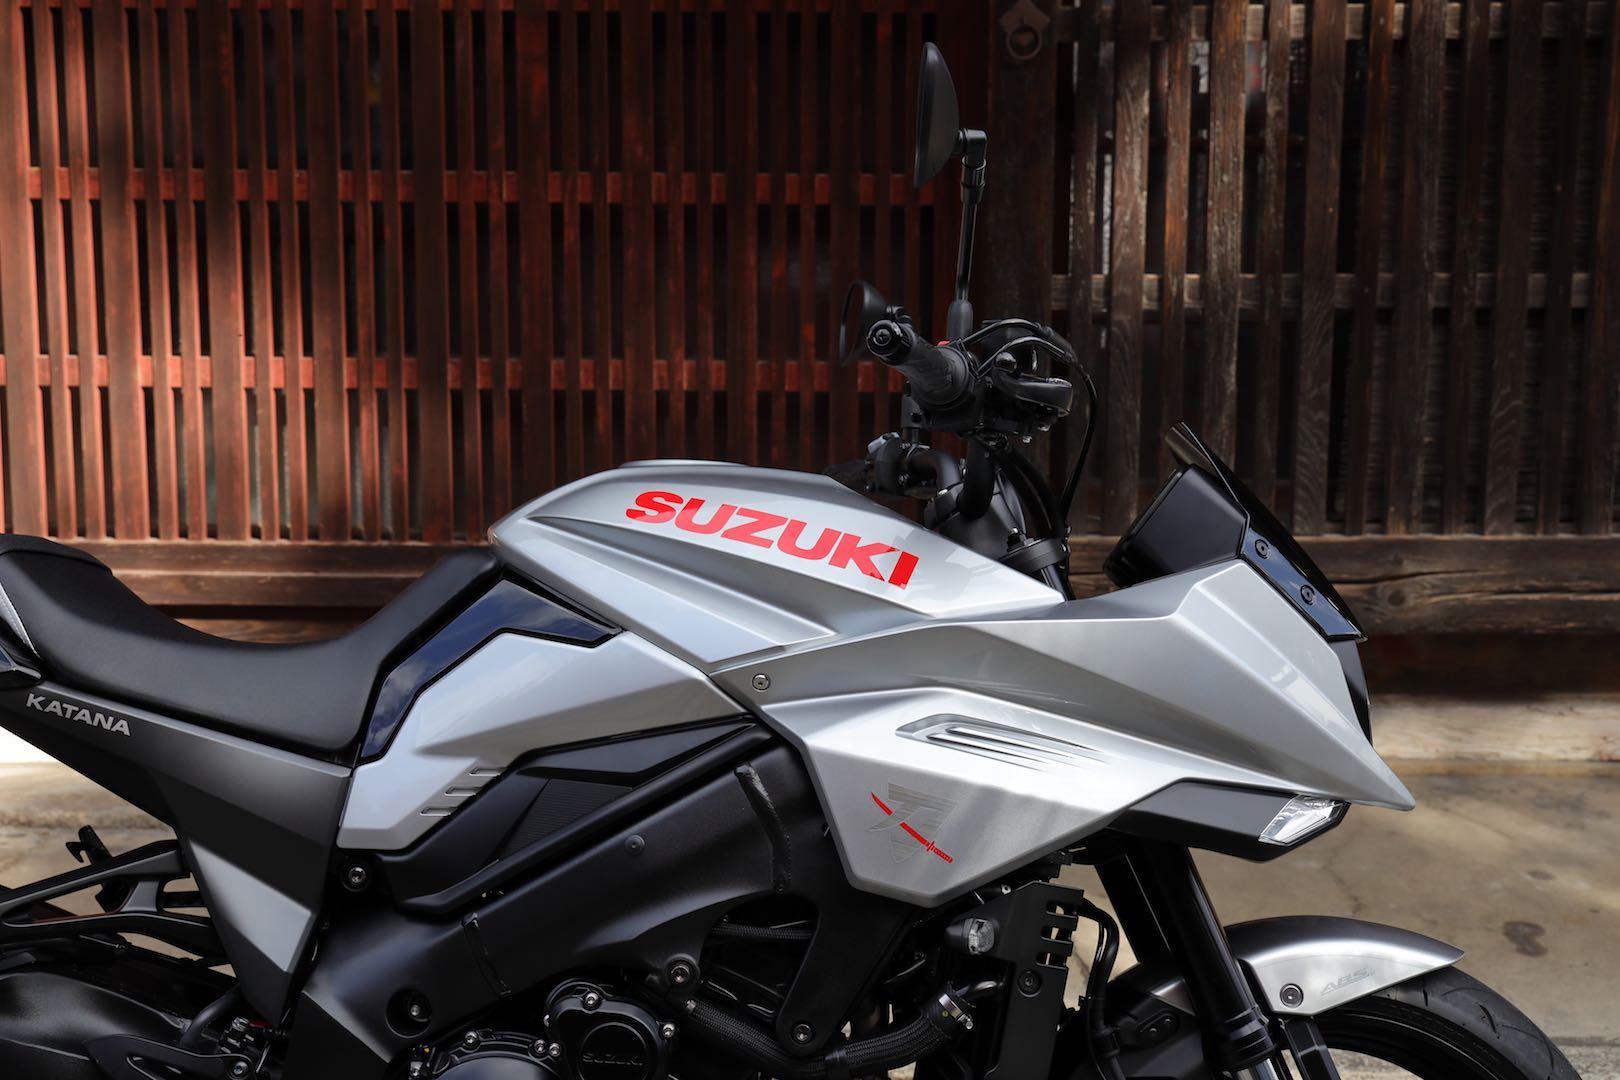 2020 Suzuki Katana styling